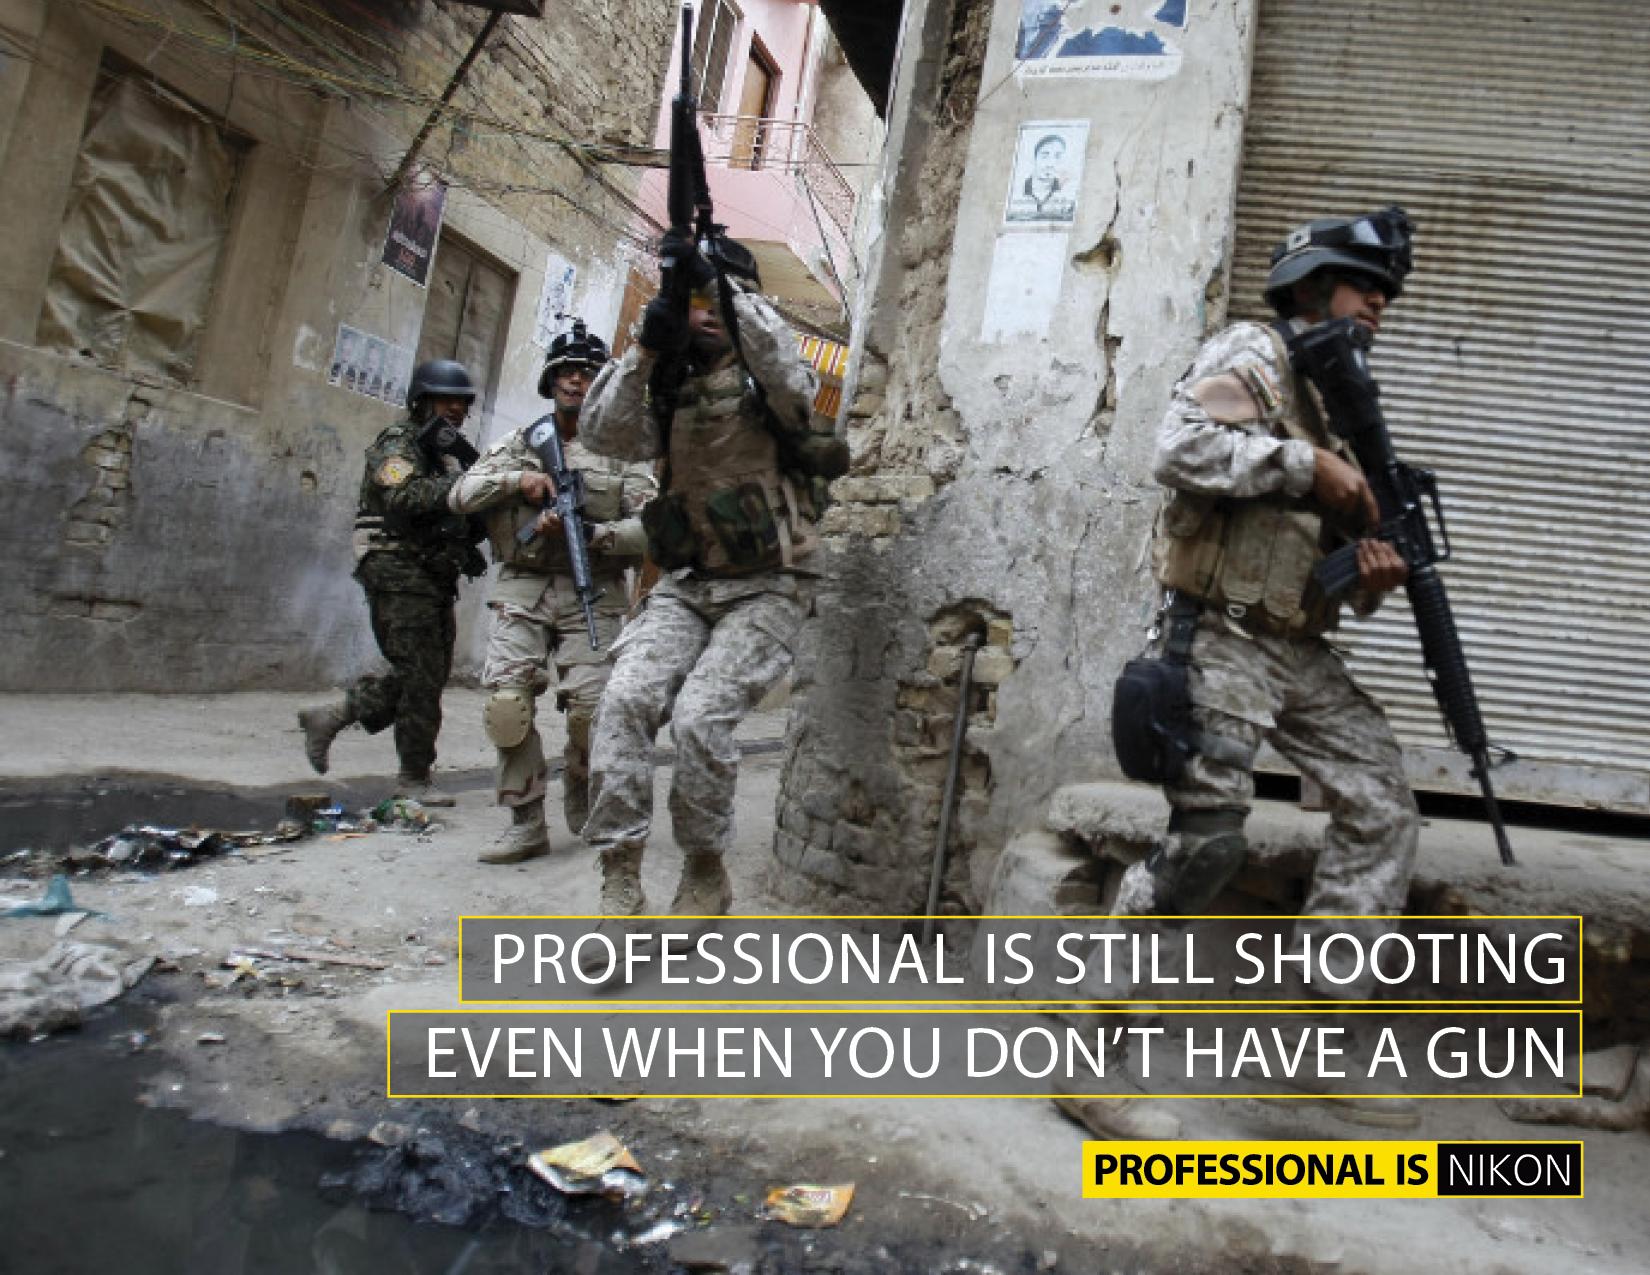 professional-nikon3.jpg